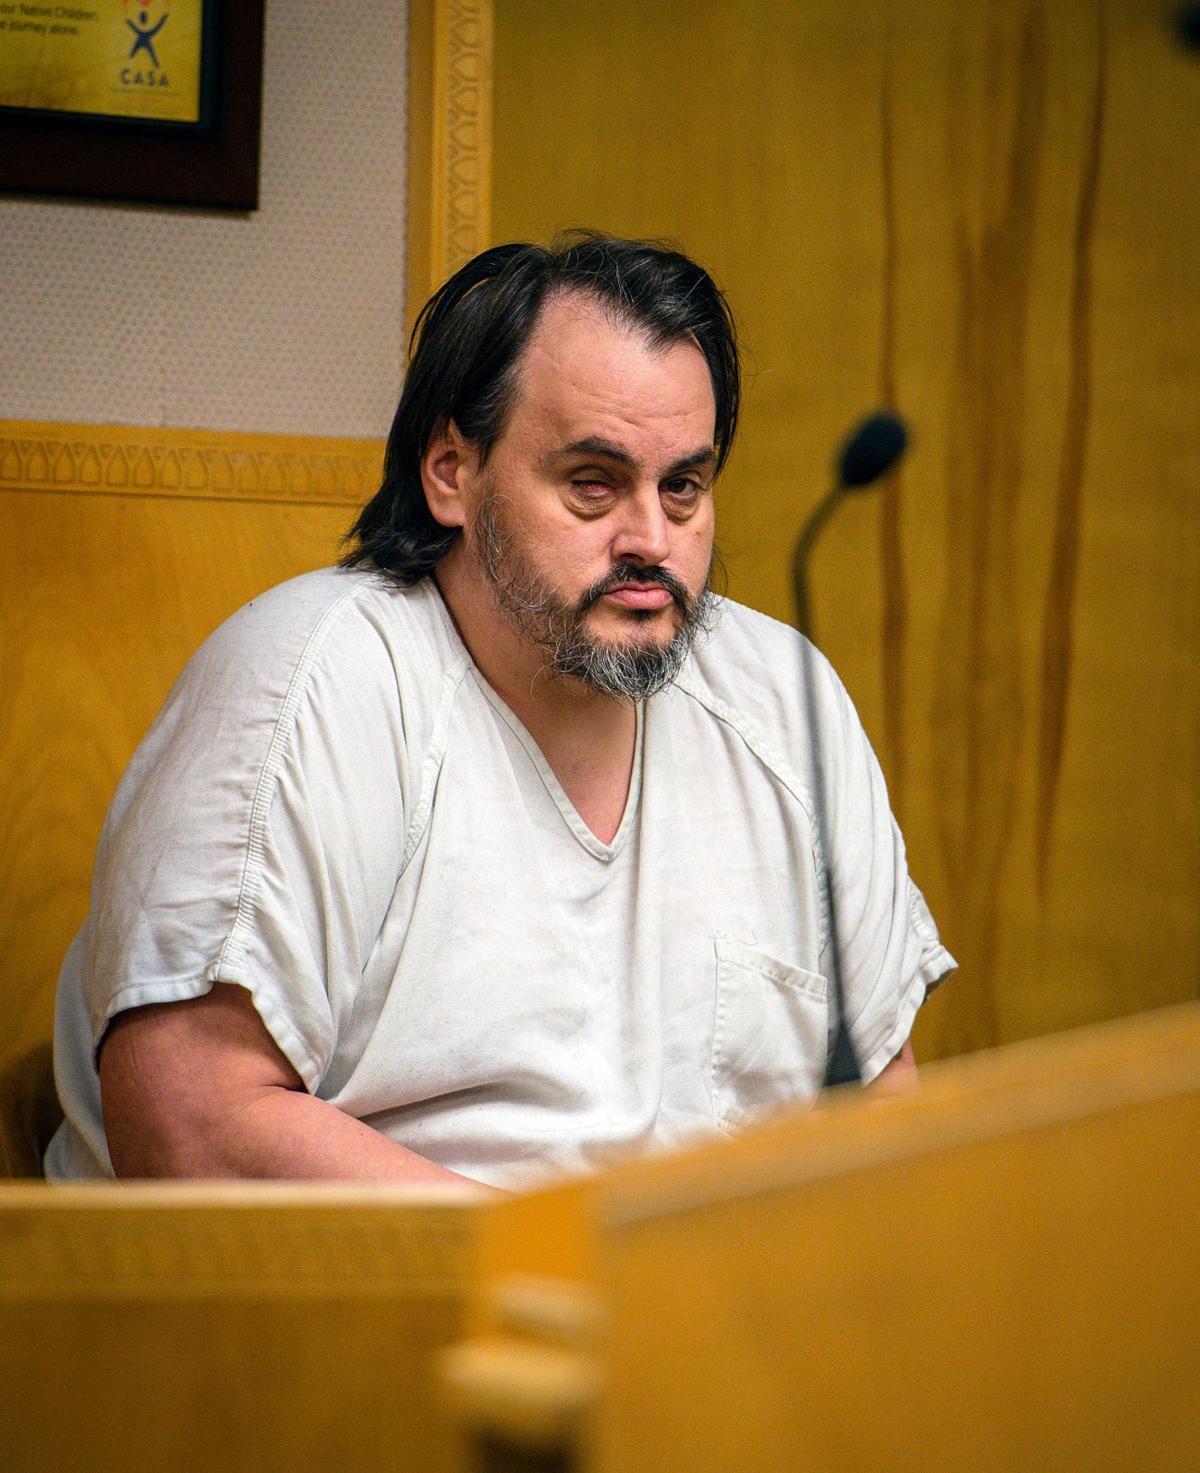 Zachary David O'Neill arraignment